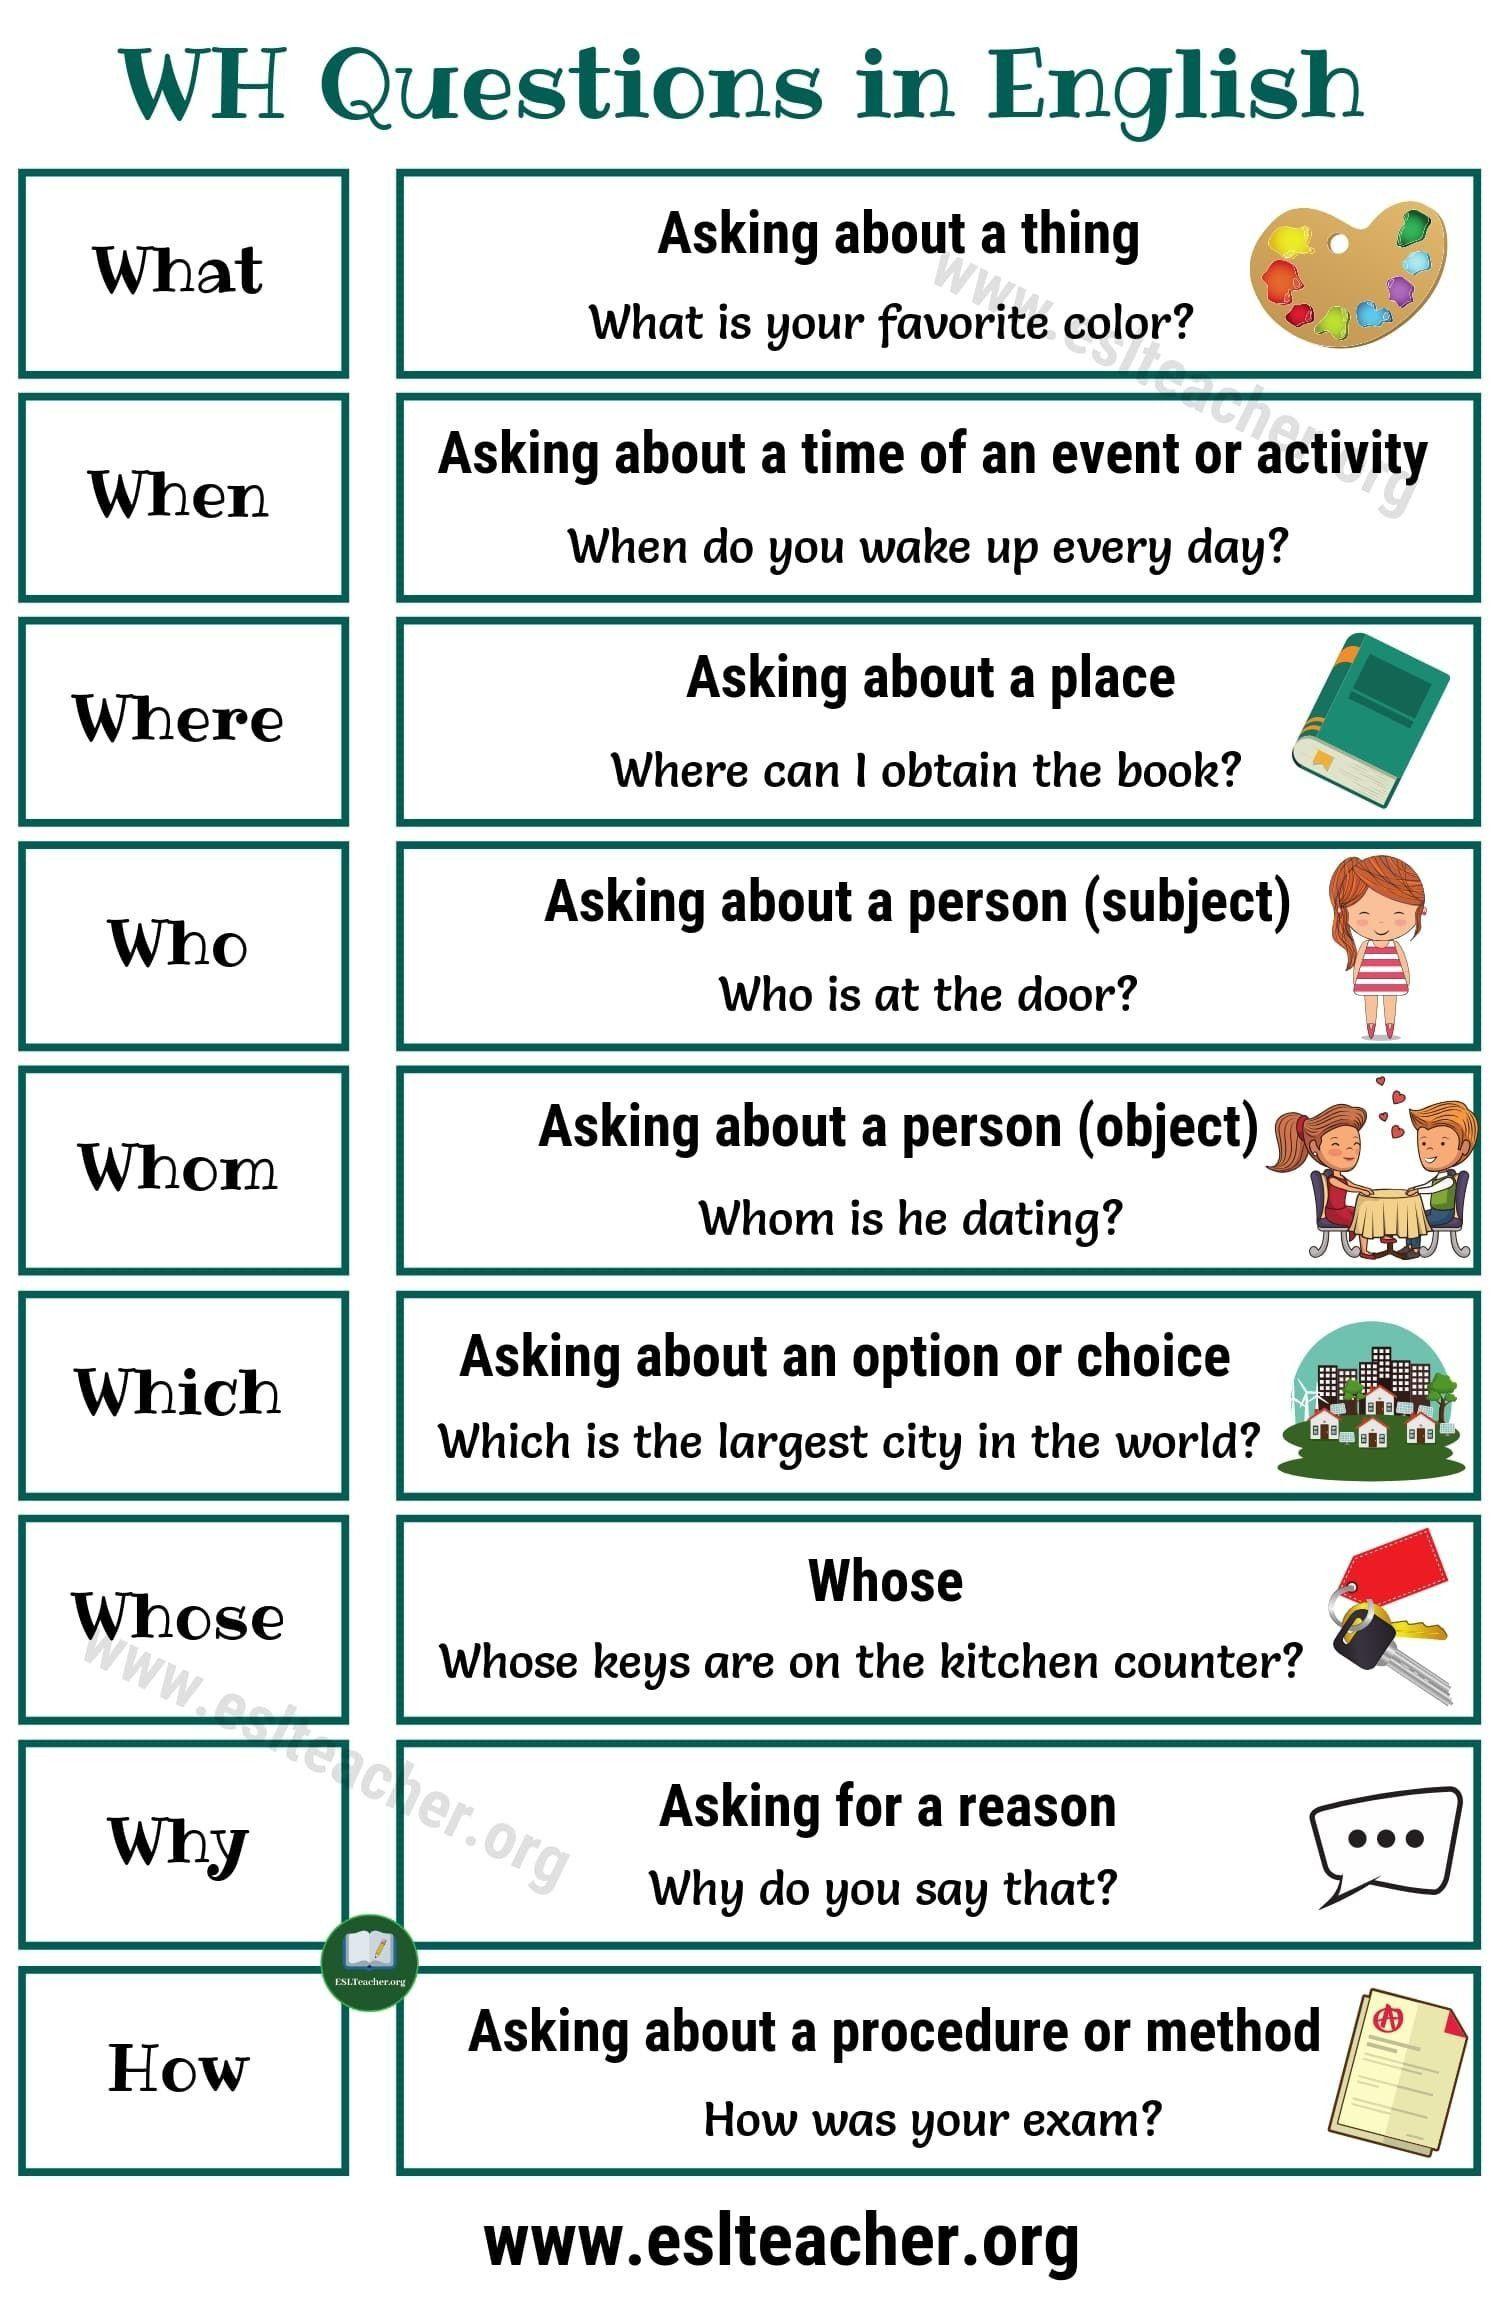 Relative Dating Worksheet Answer Key | Worksheet for Education